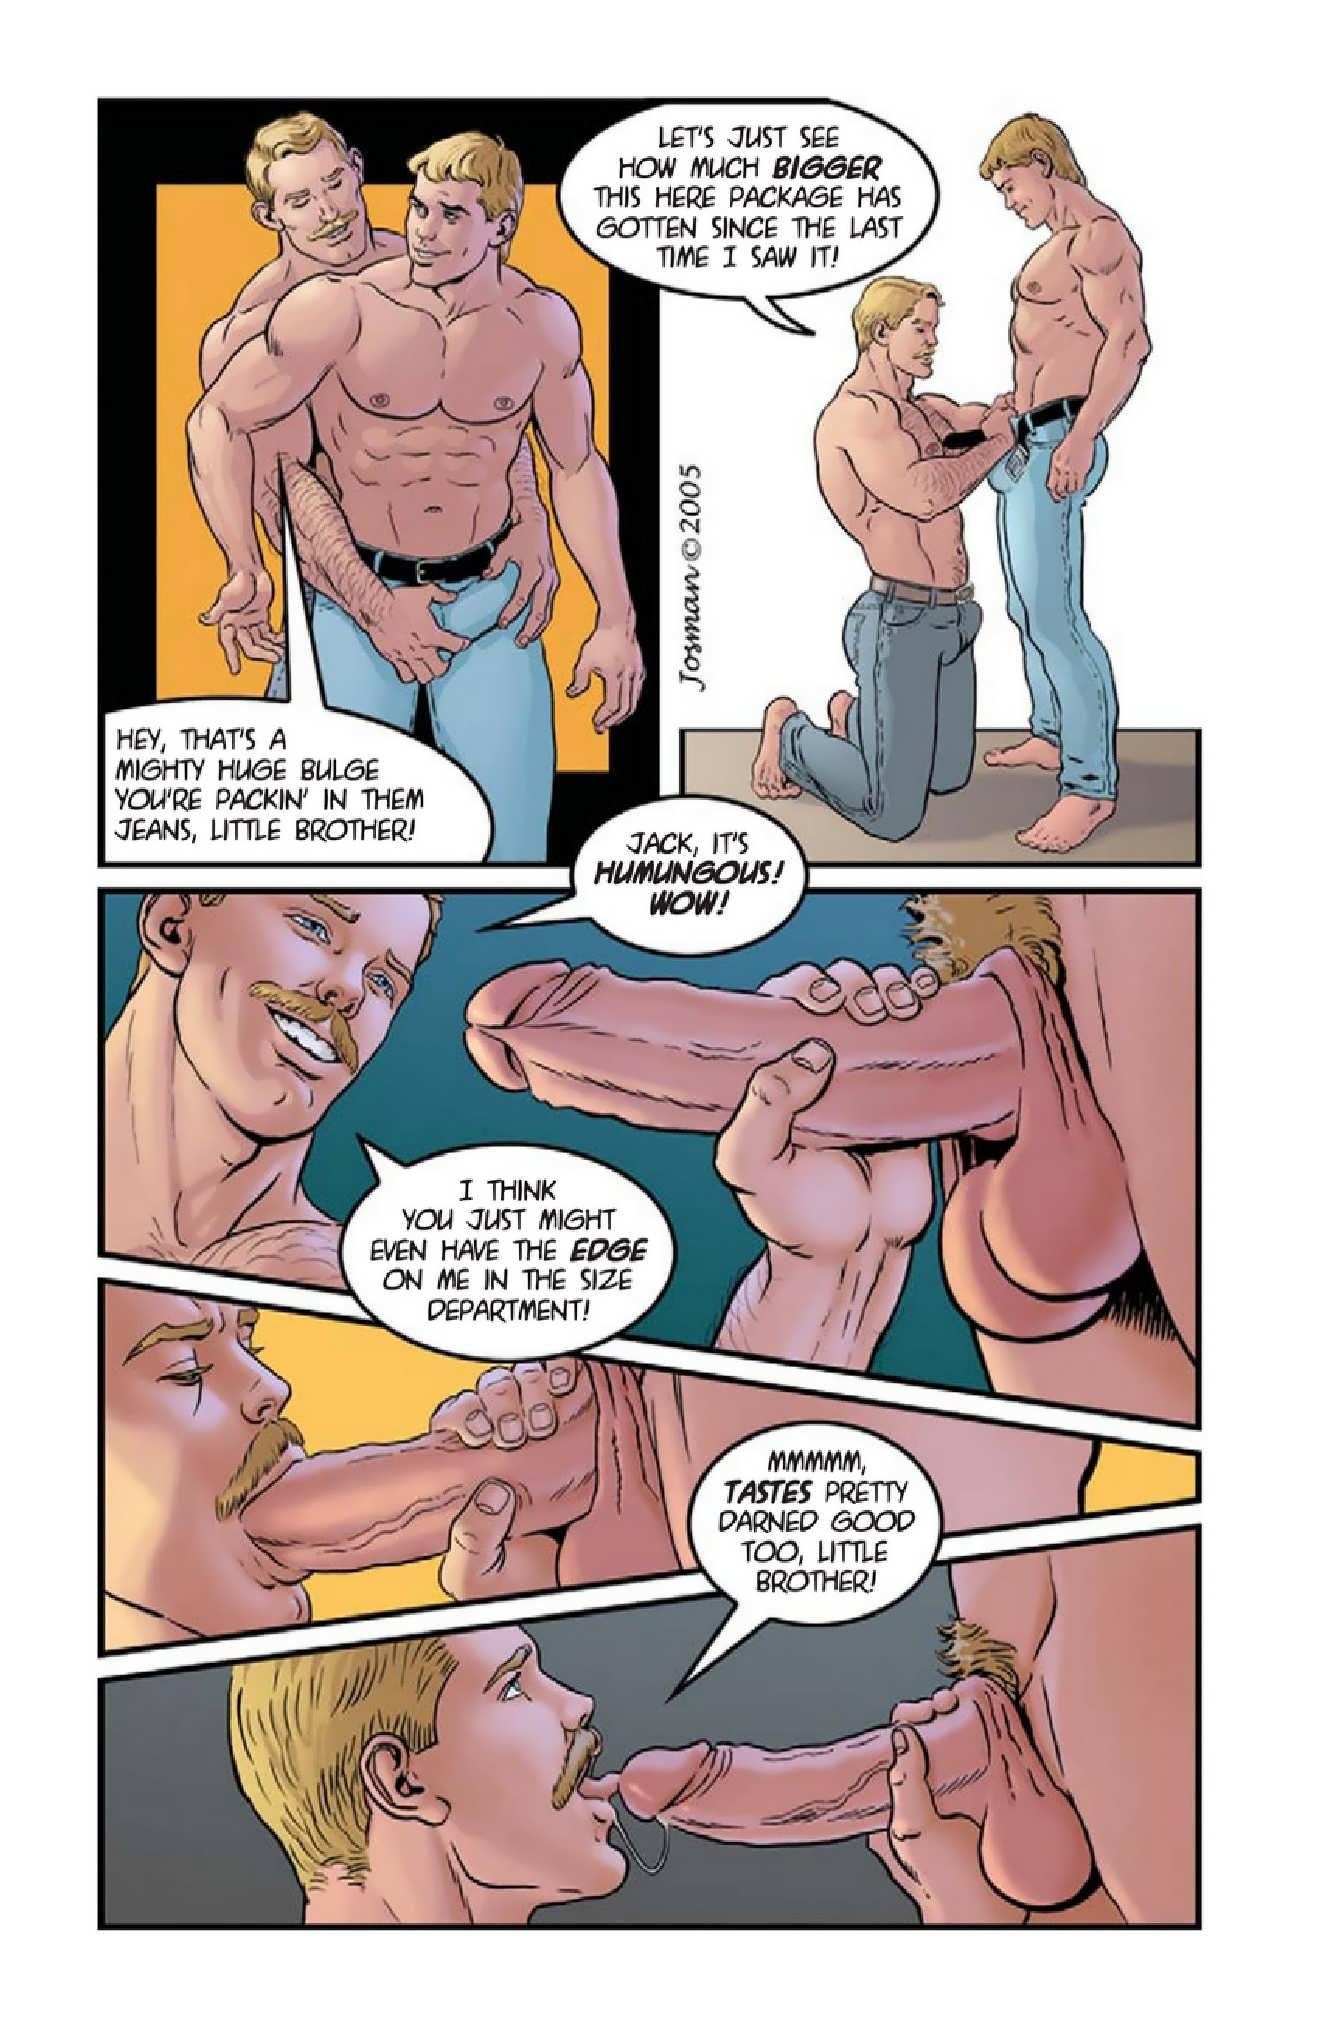 Jail gay men sex cum big dick ryan sharp is 9